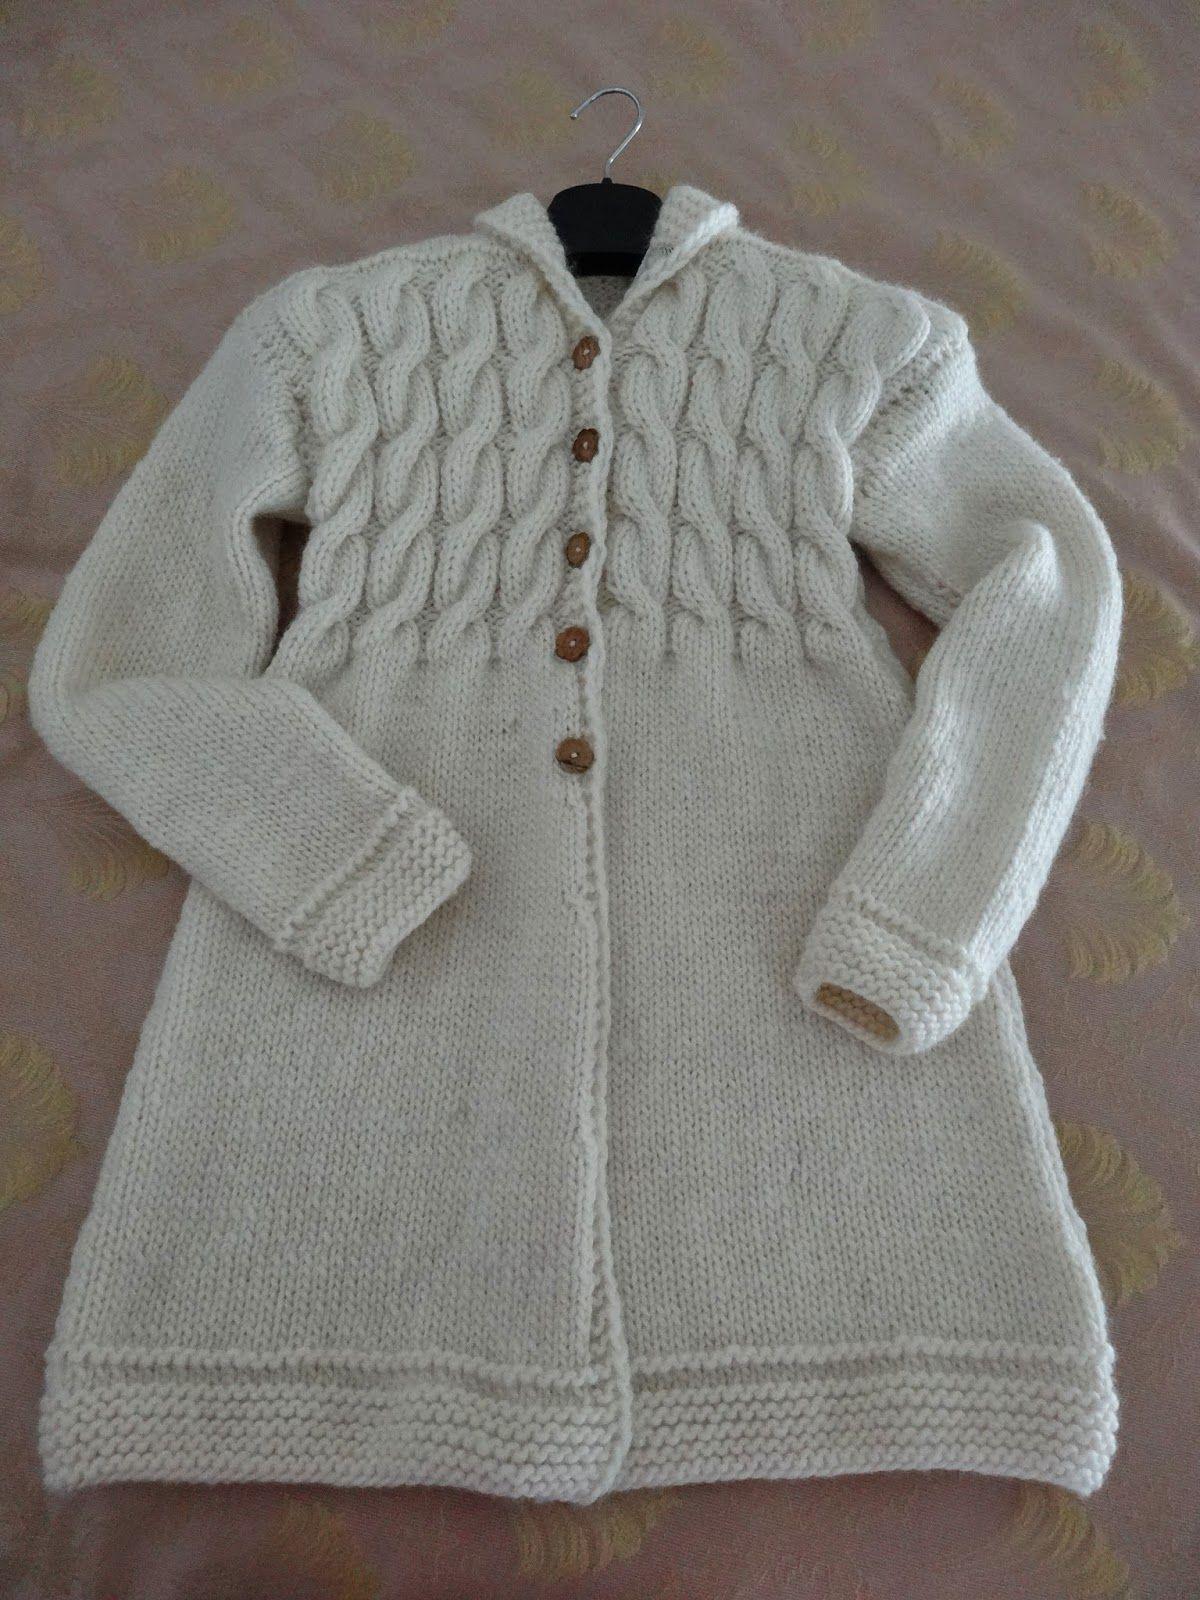 Imagenes de abrigos de lana para ninas